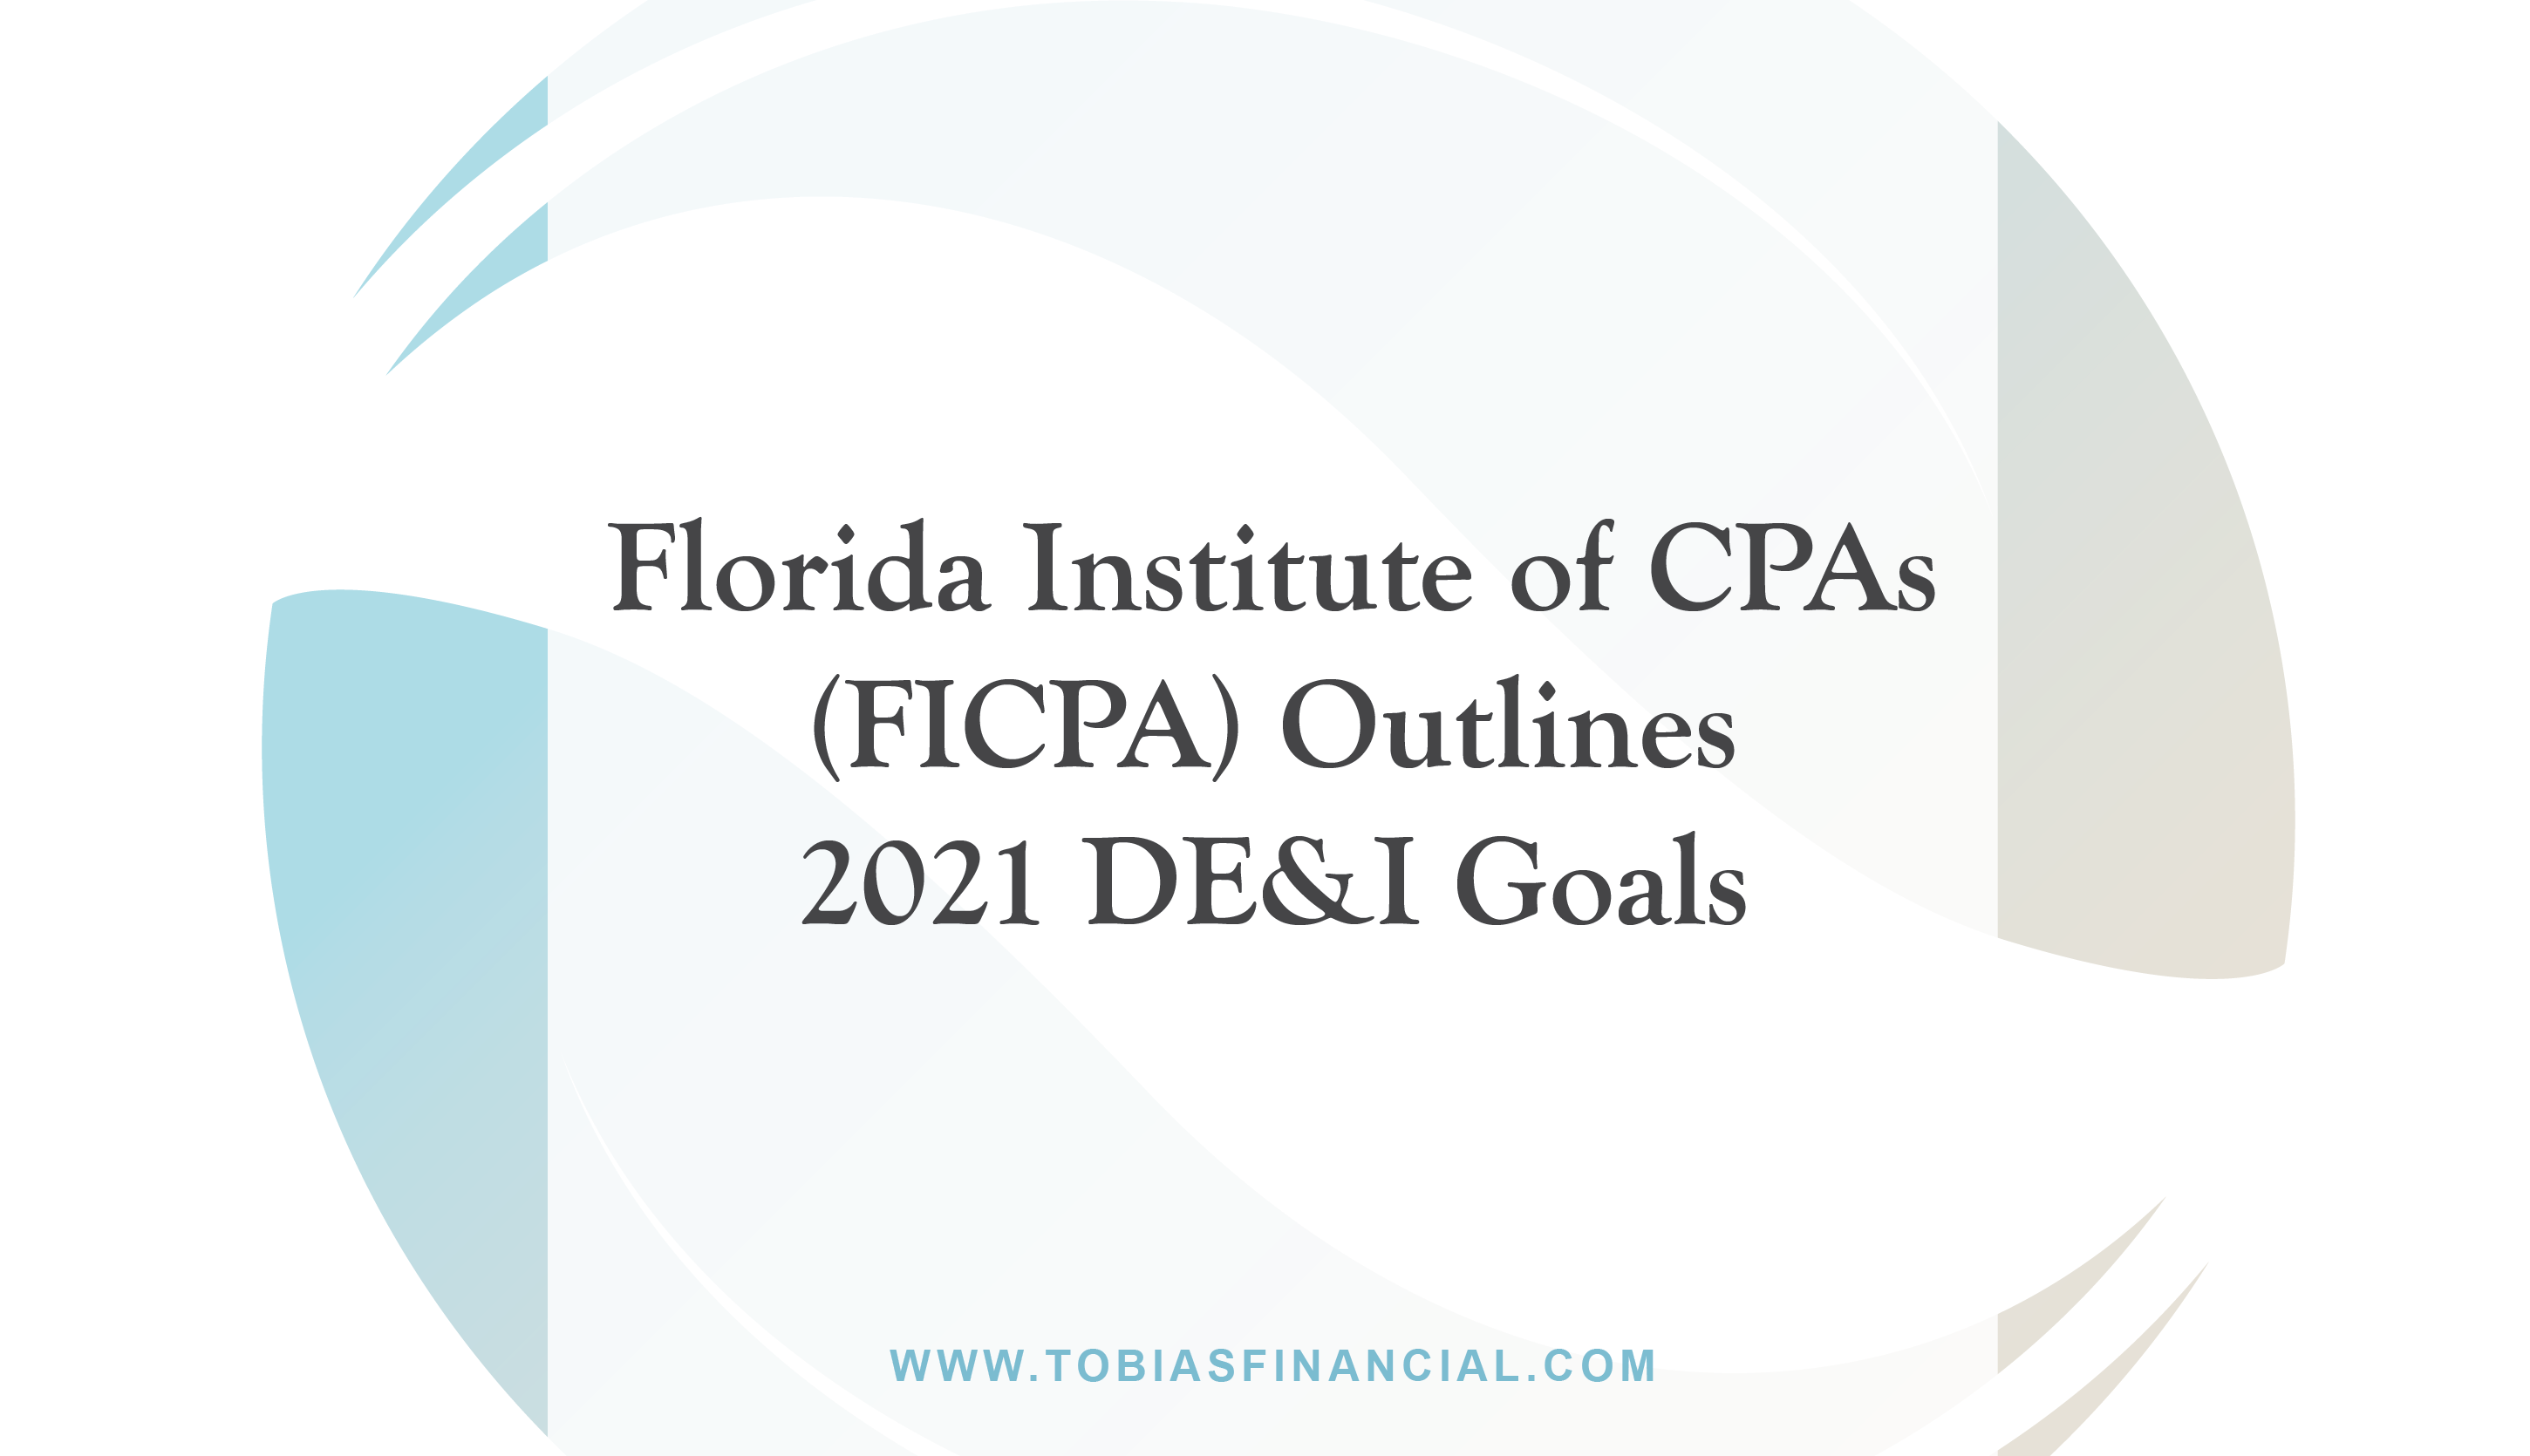 Florida Institute of CPAs (FICPA) Outlines 2021 DE&I Goals